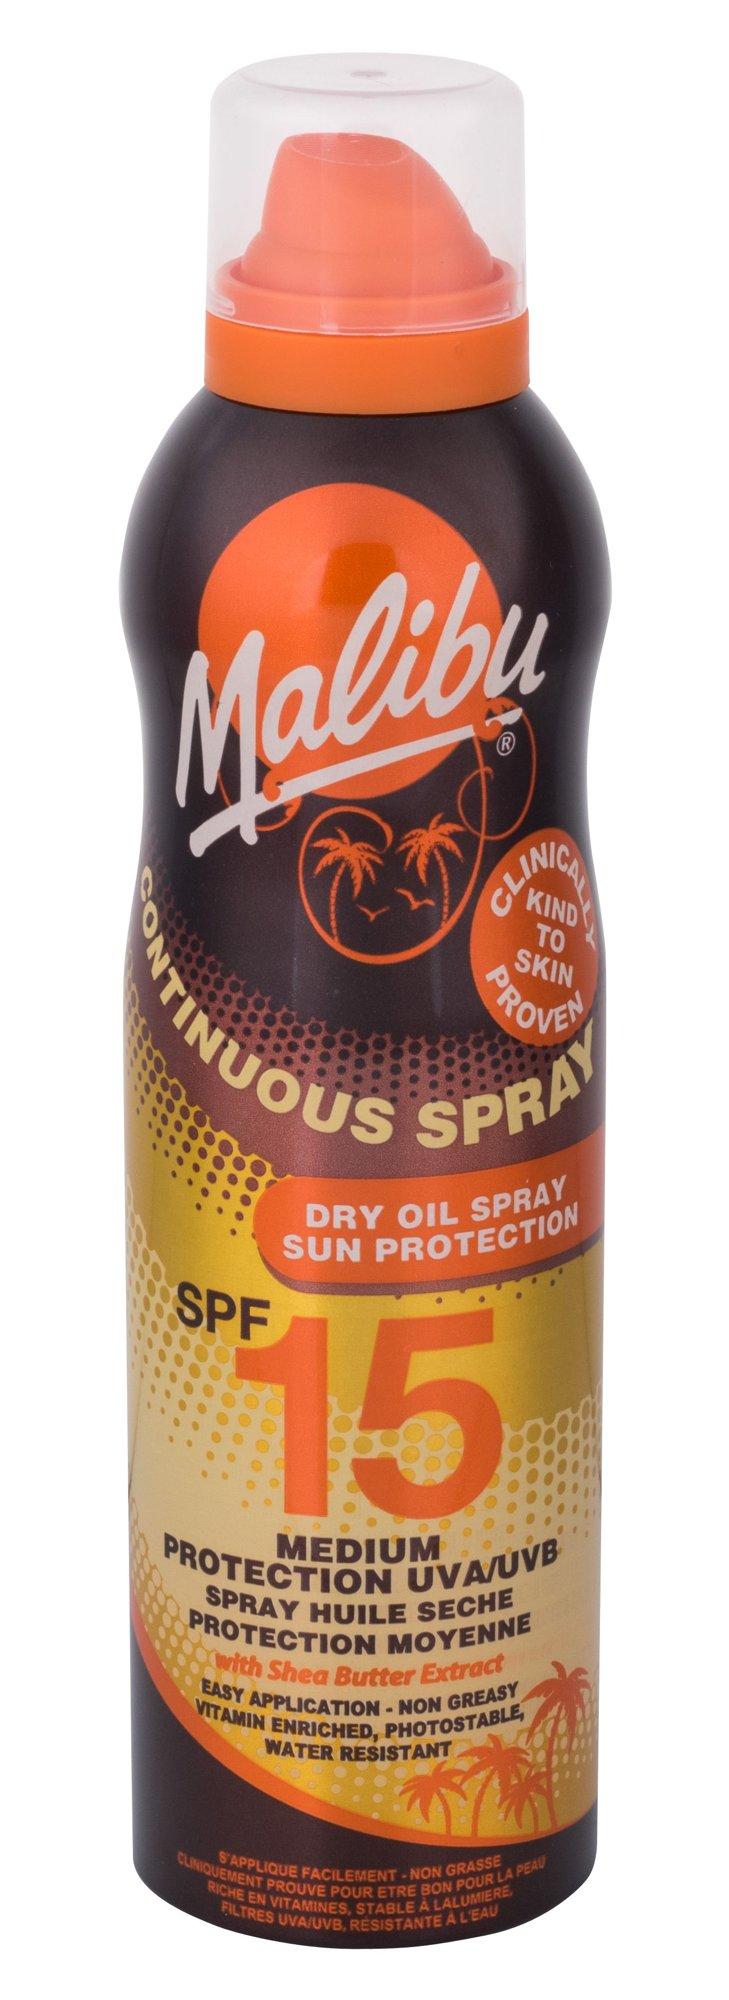 Malibu Continuous Spray Sun Body Lotion 175ml  Dry Oil